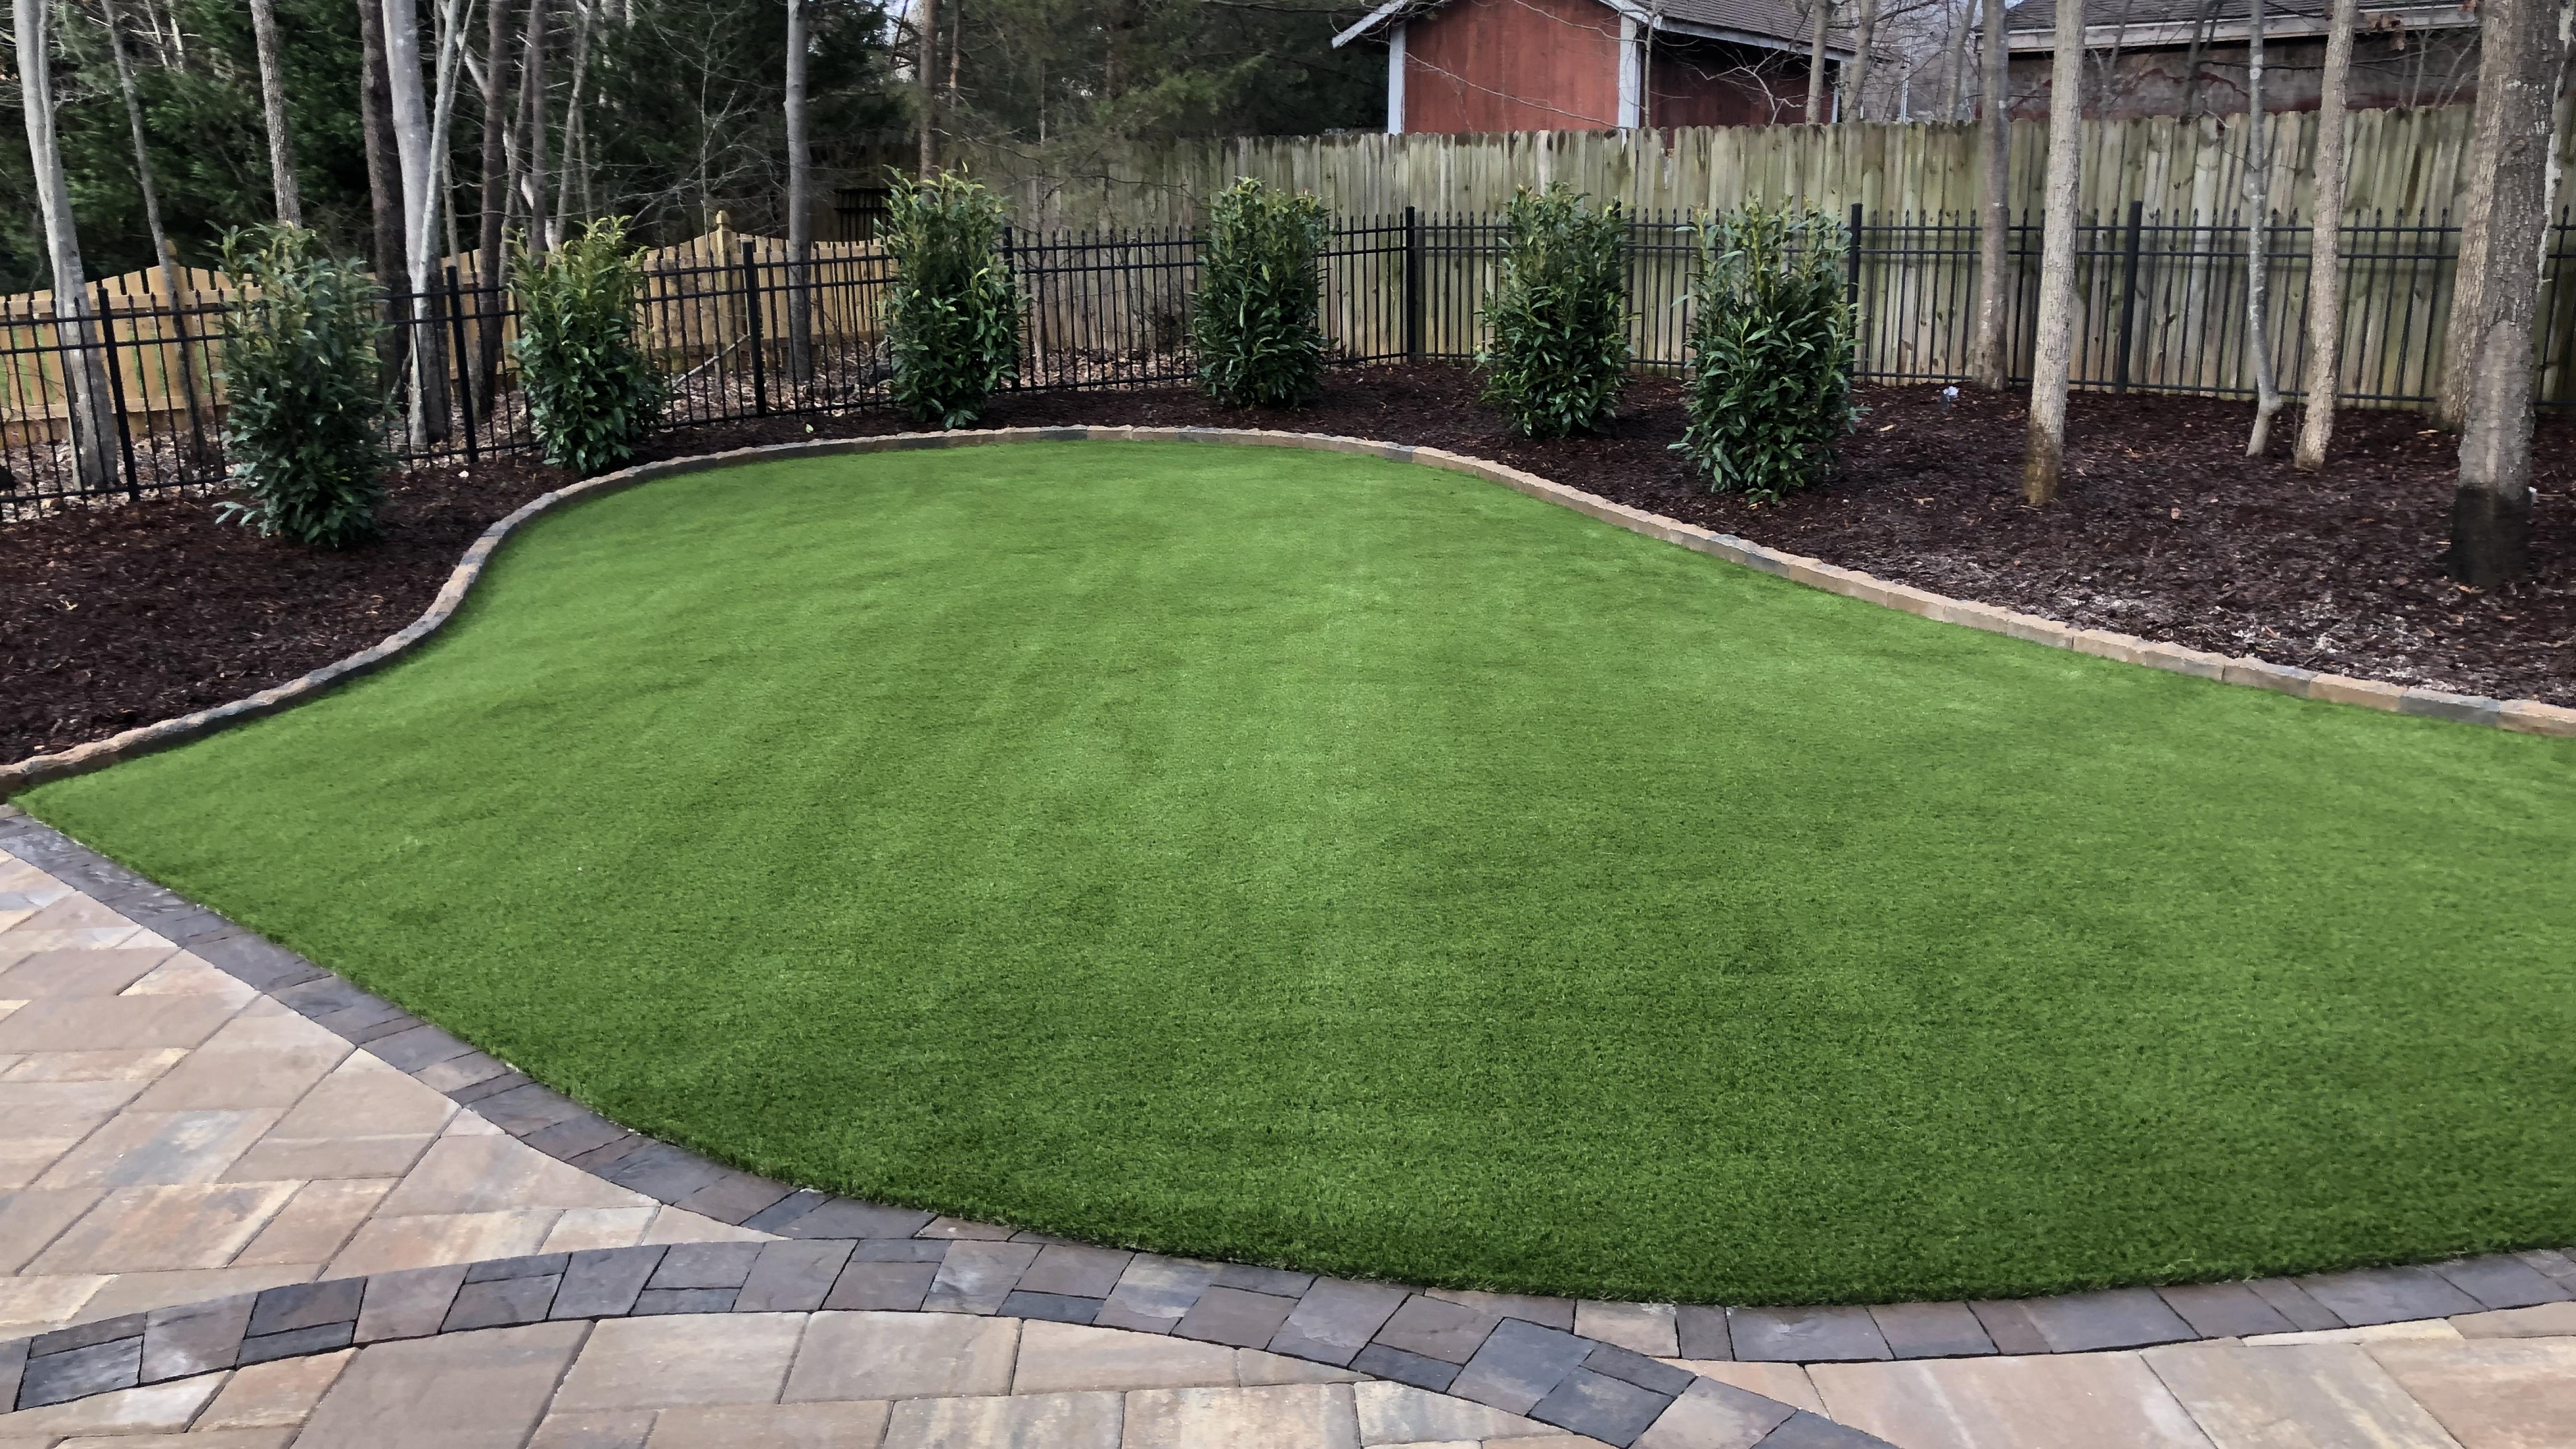 Super Natural 60 most realistic artificial grass,realistic artificial grass,most realistic artificial grass,artificial lawn,synthetic lawn,fake lawn,turf lawn,fake grass lawn